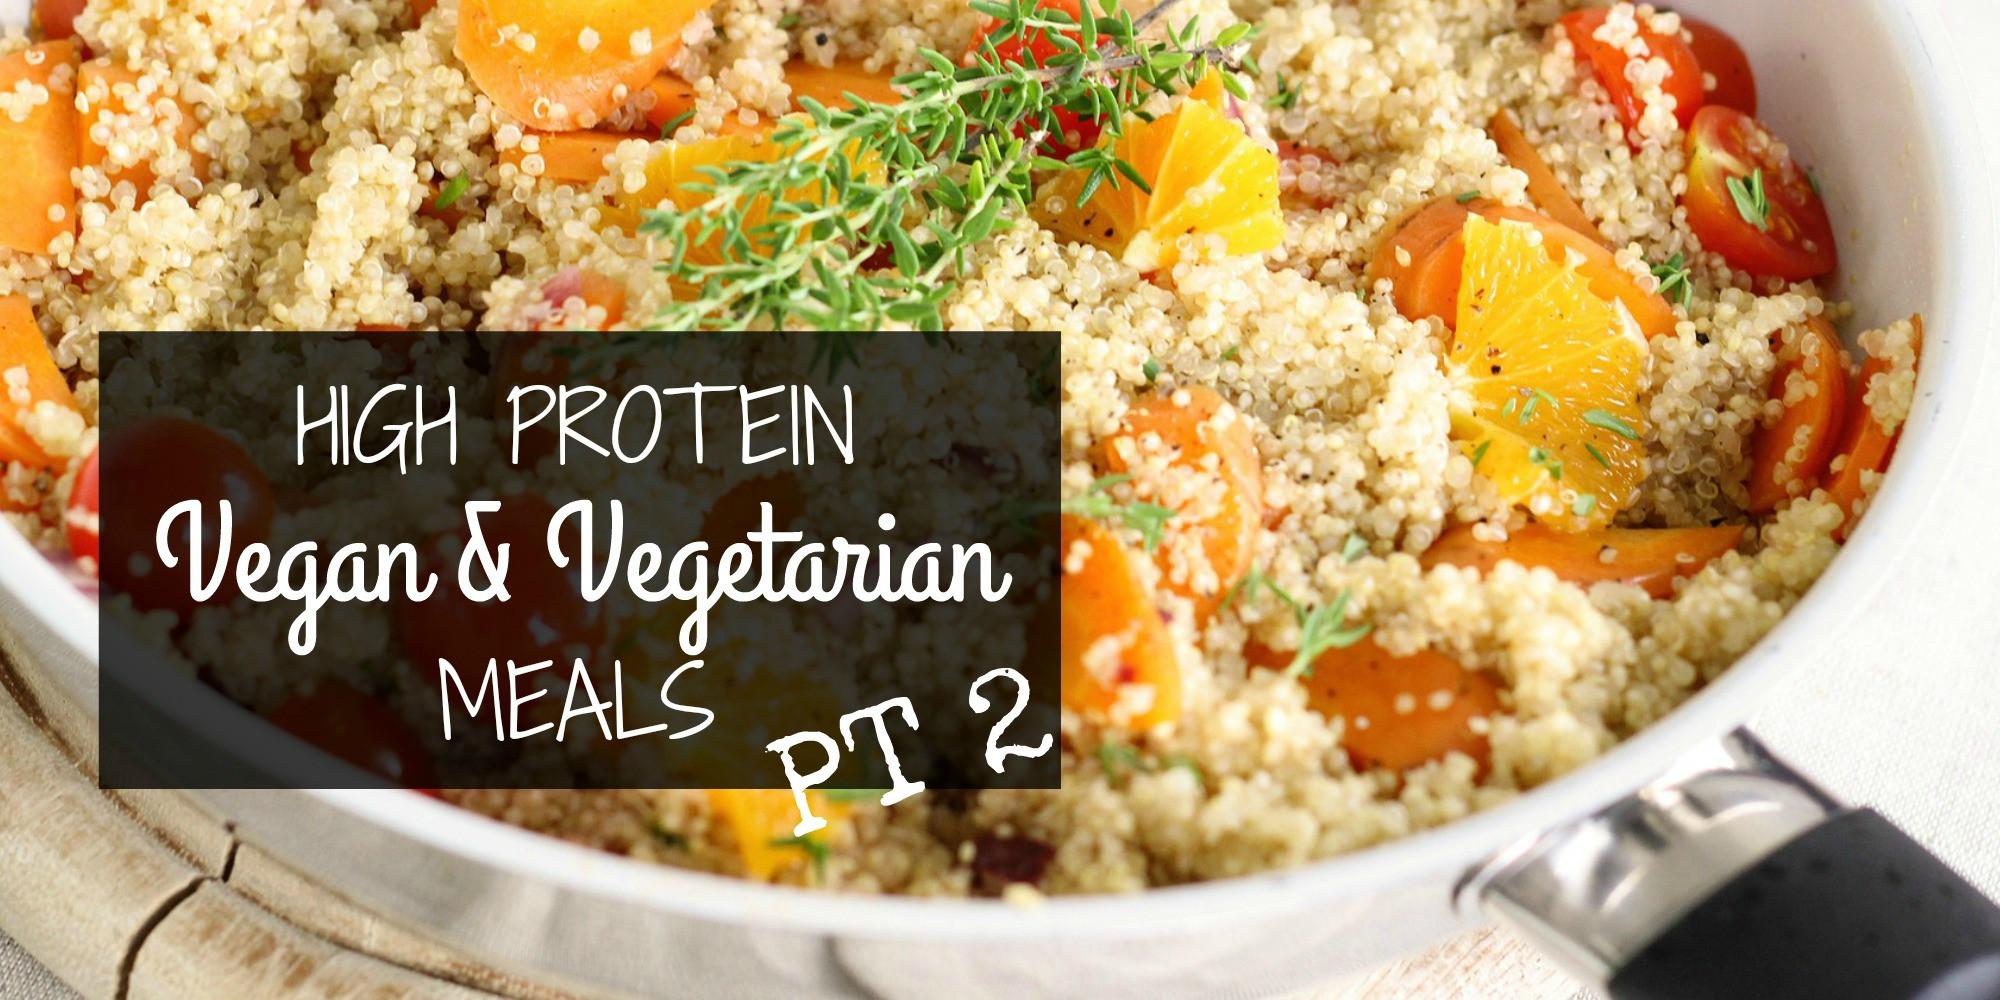 High Protein Vegan Recipes  High Protein Ve arian & Vegan Meals Part 2 – Hadron